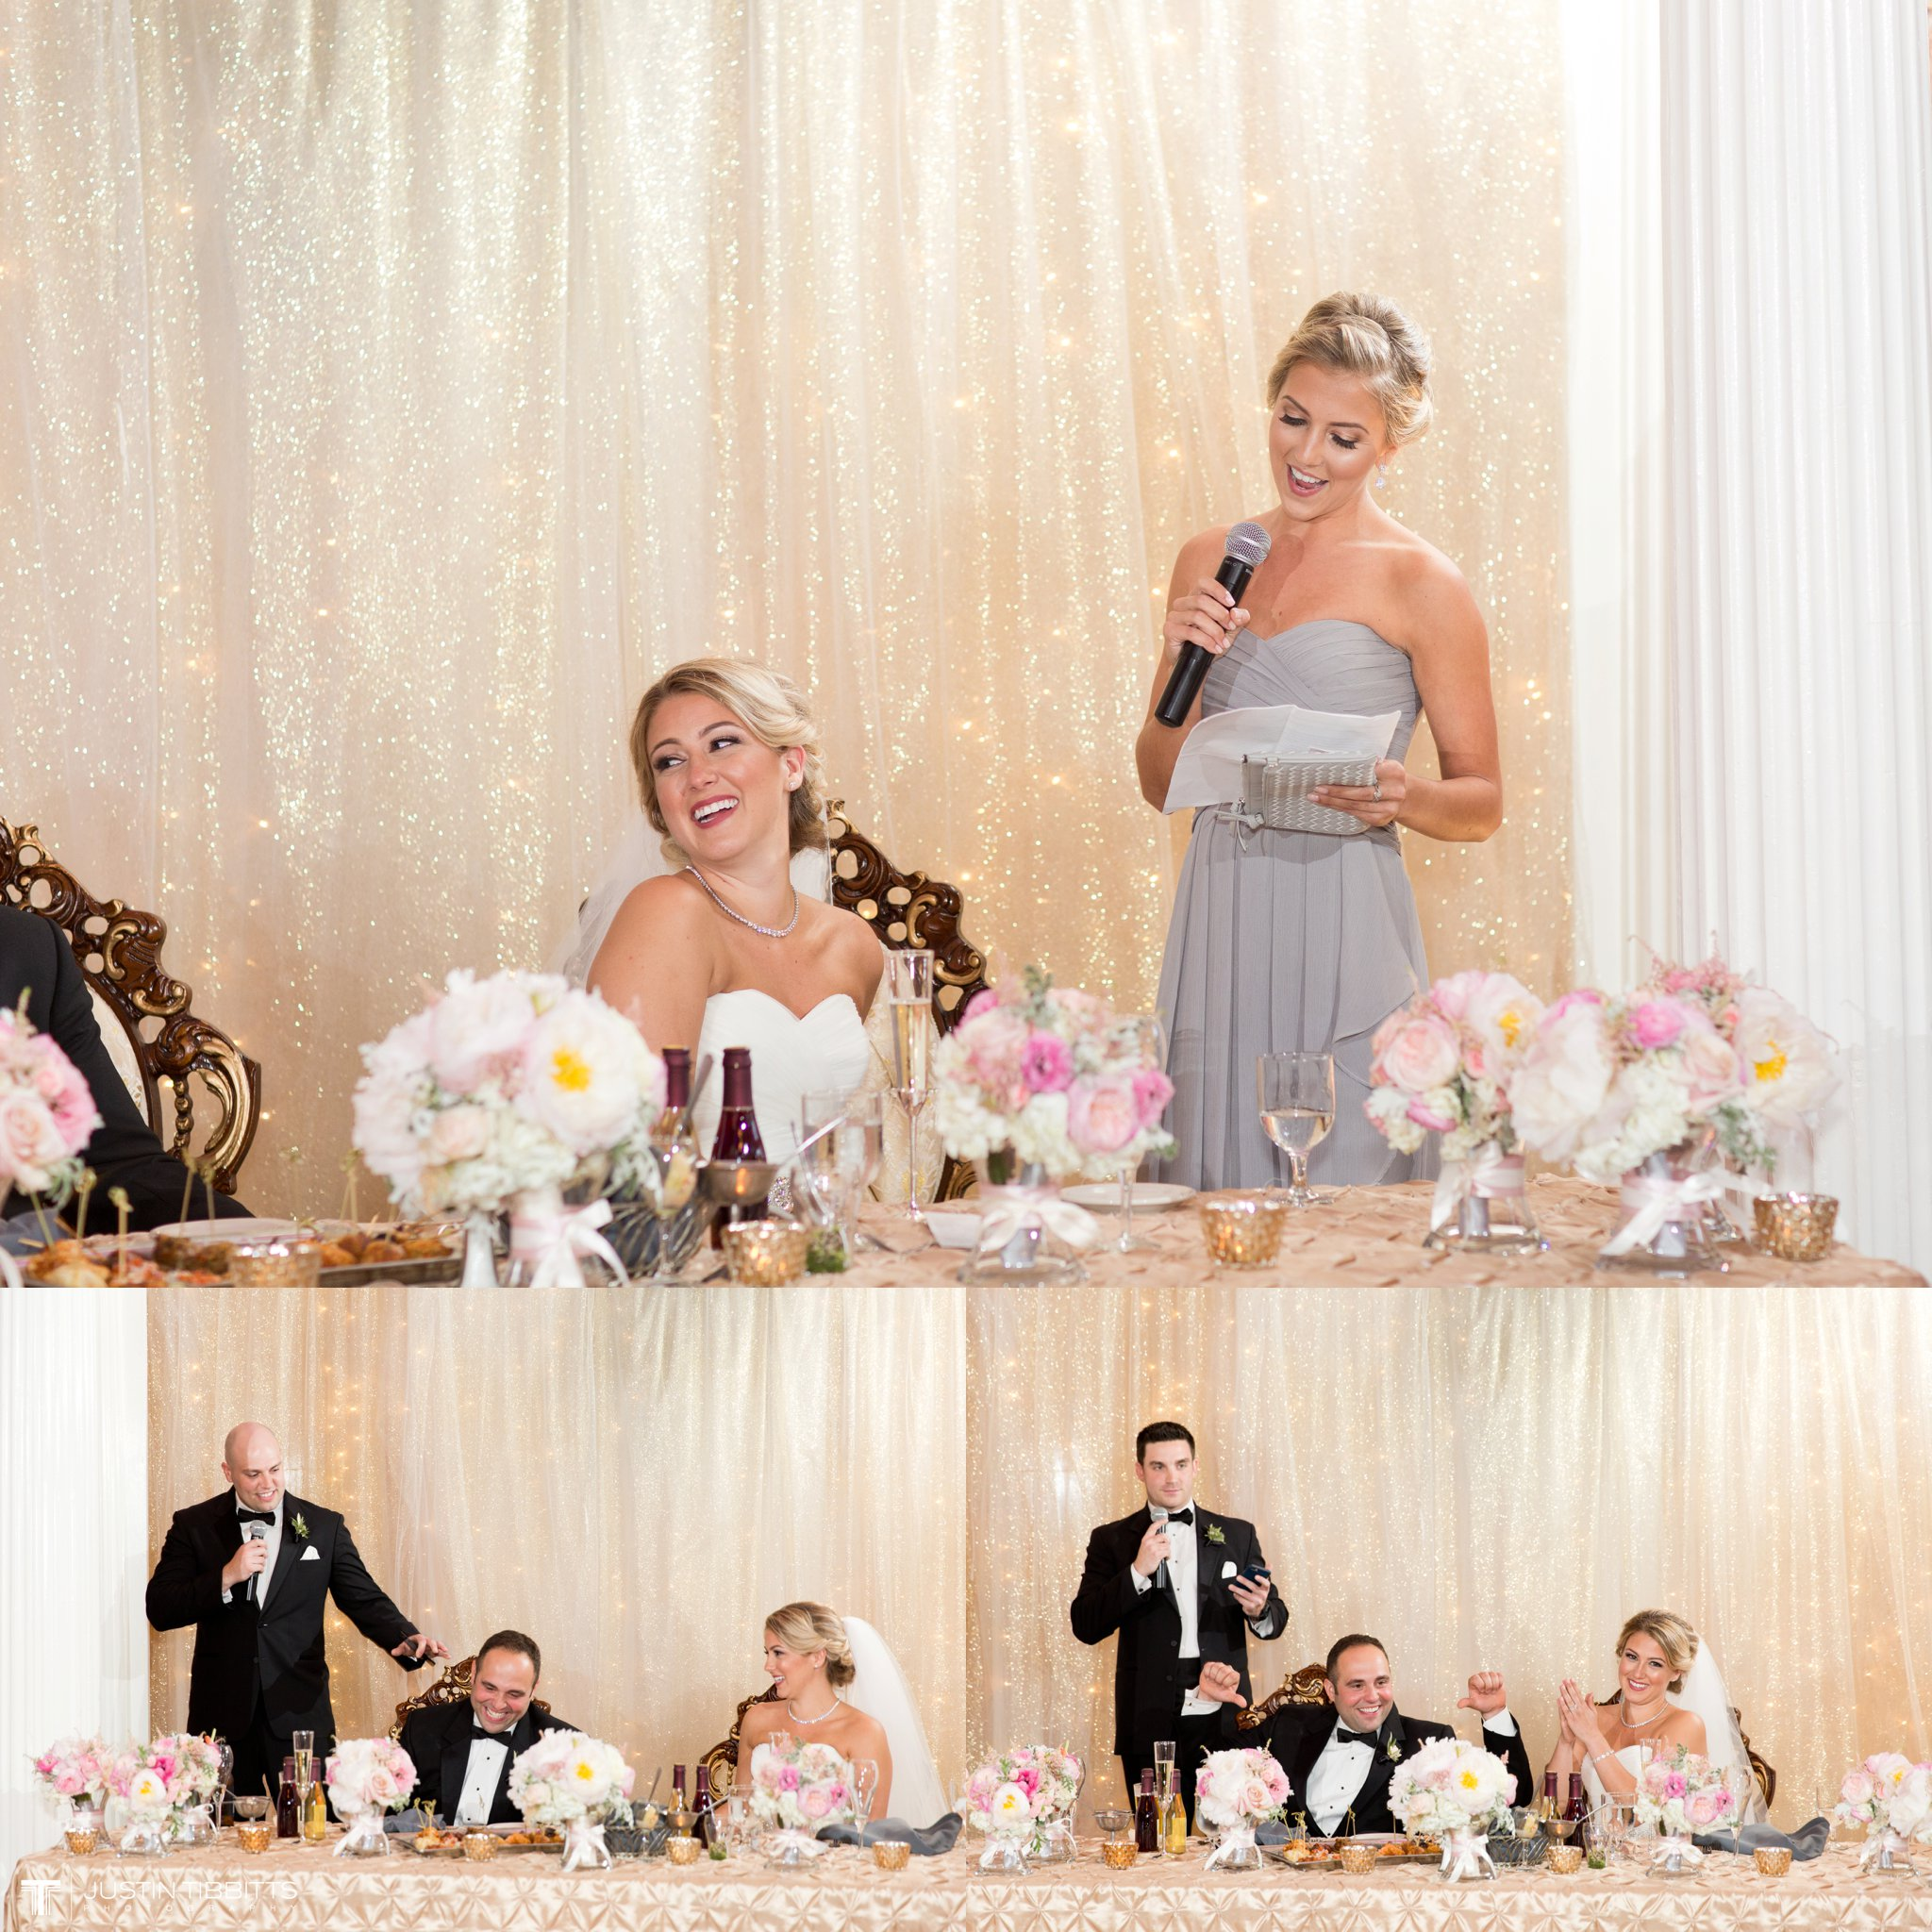 state-room-wedding-photos-with-amanda-and-nick_0168